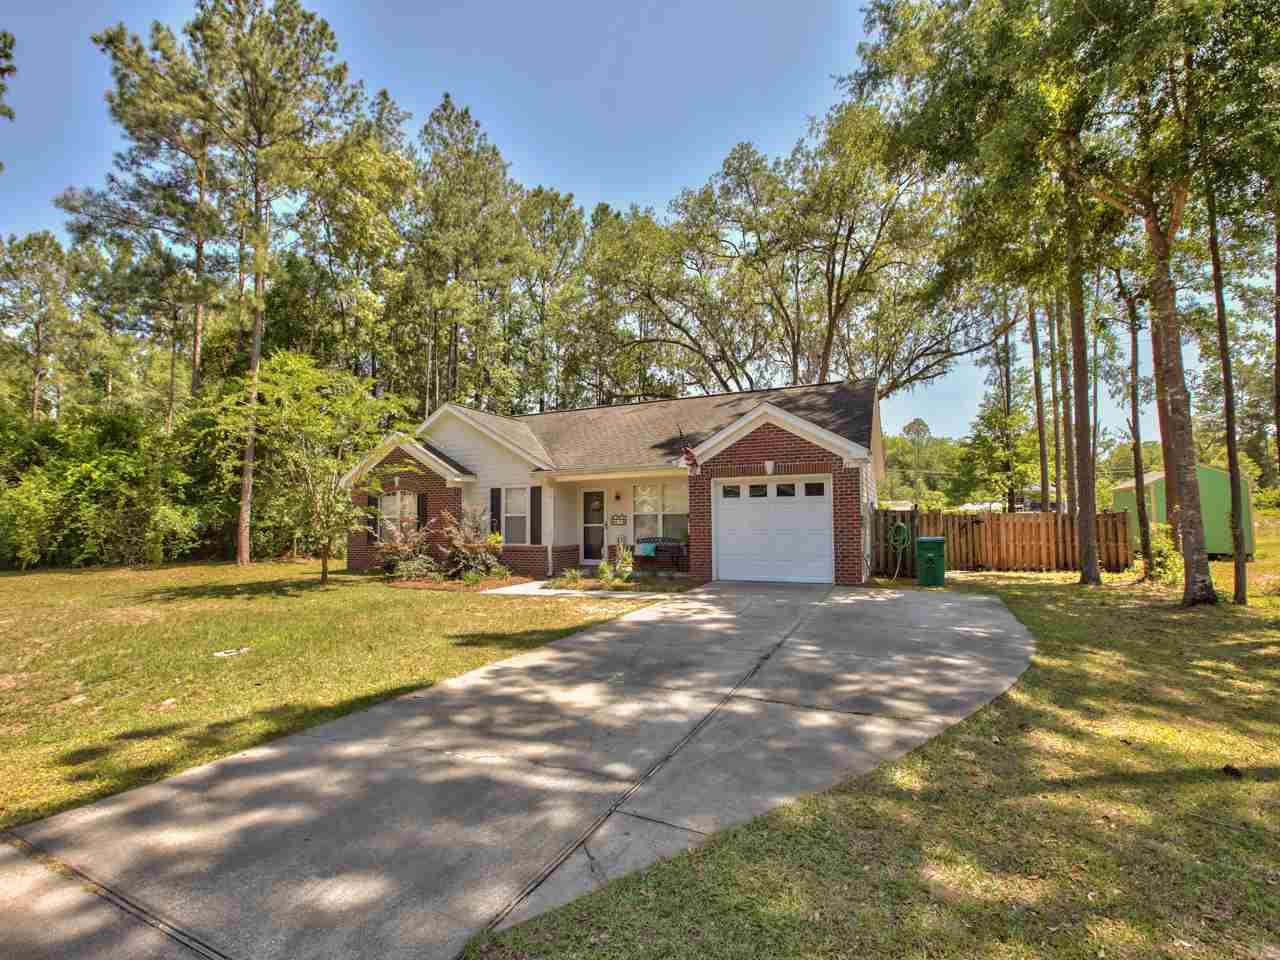 47 Meadowlark Drive, Crawfordville, FL 32327 - MLS#: 318685